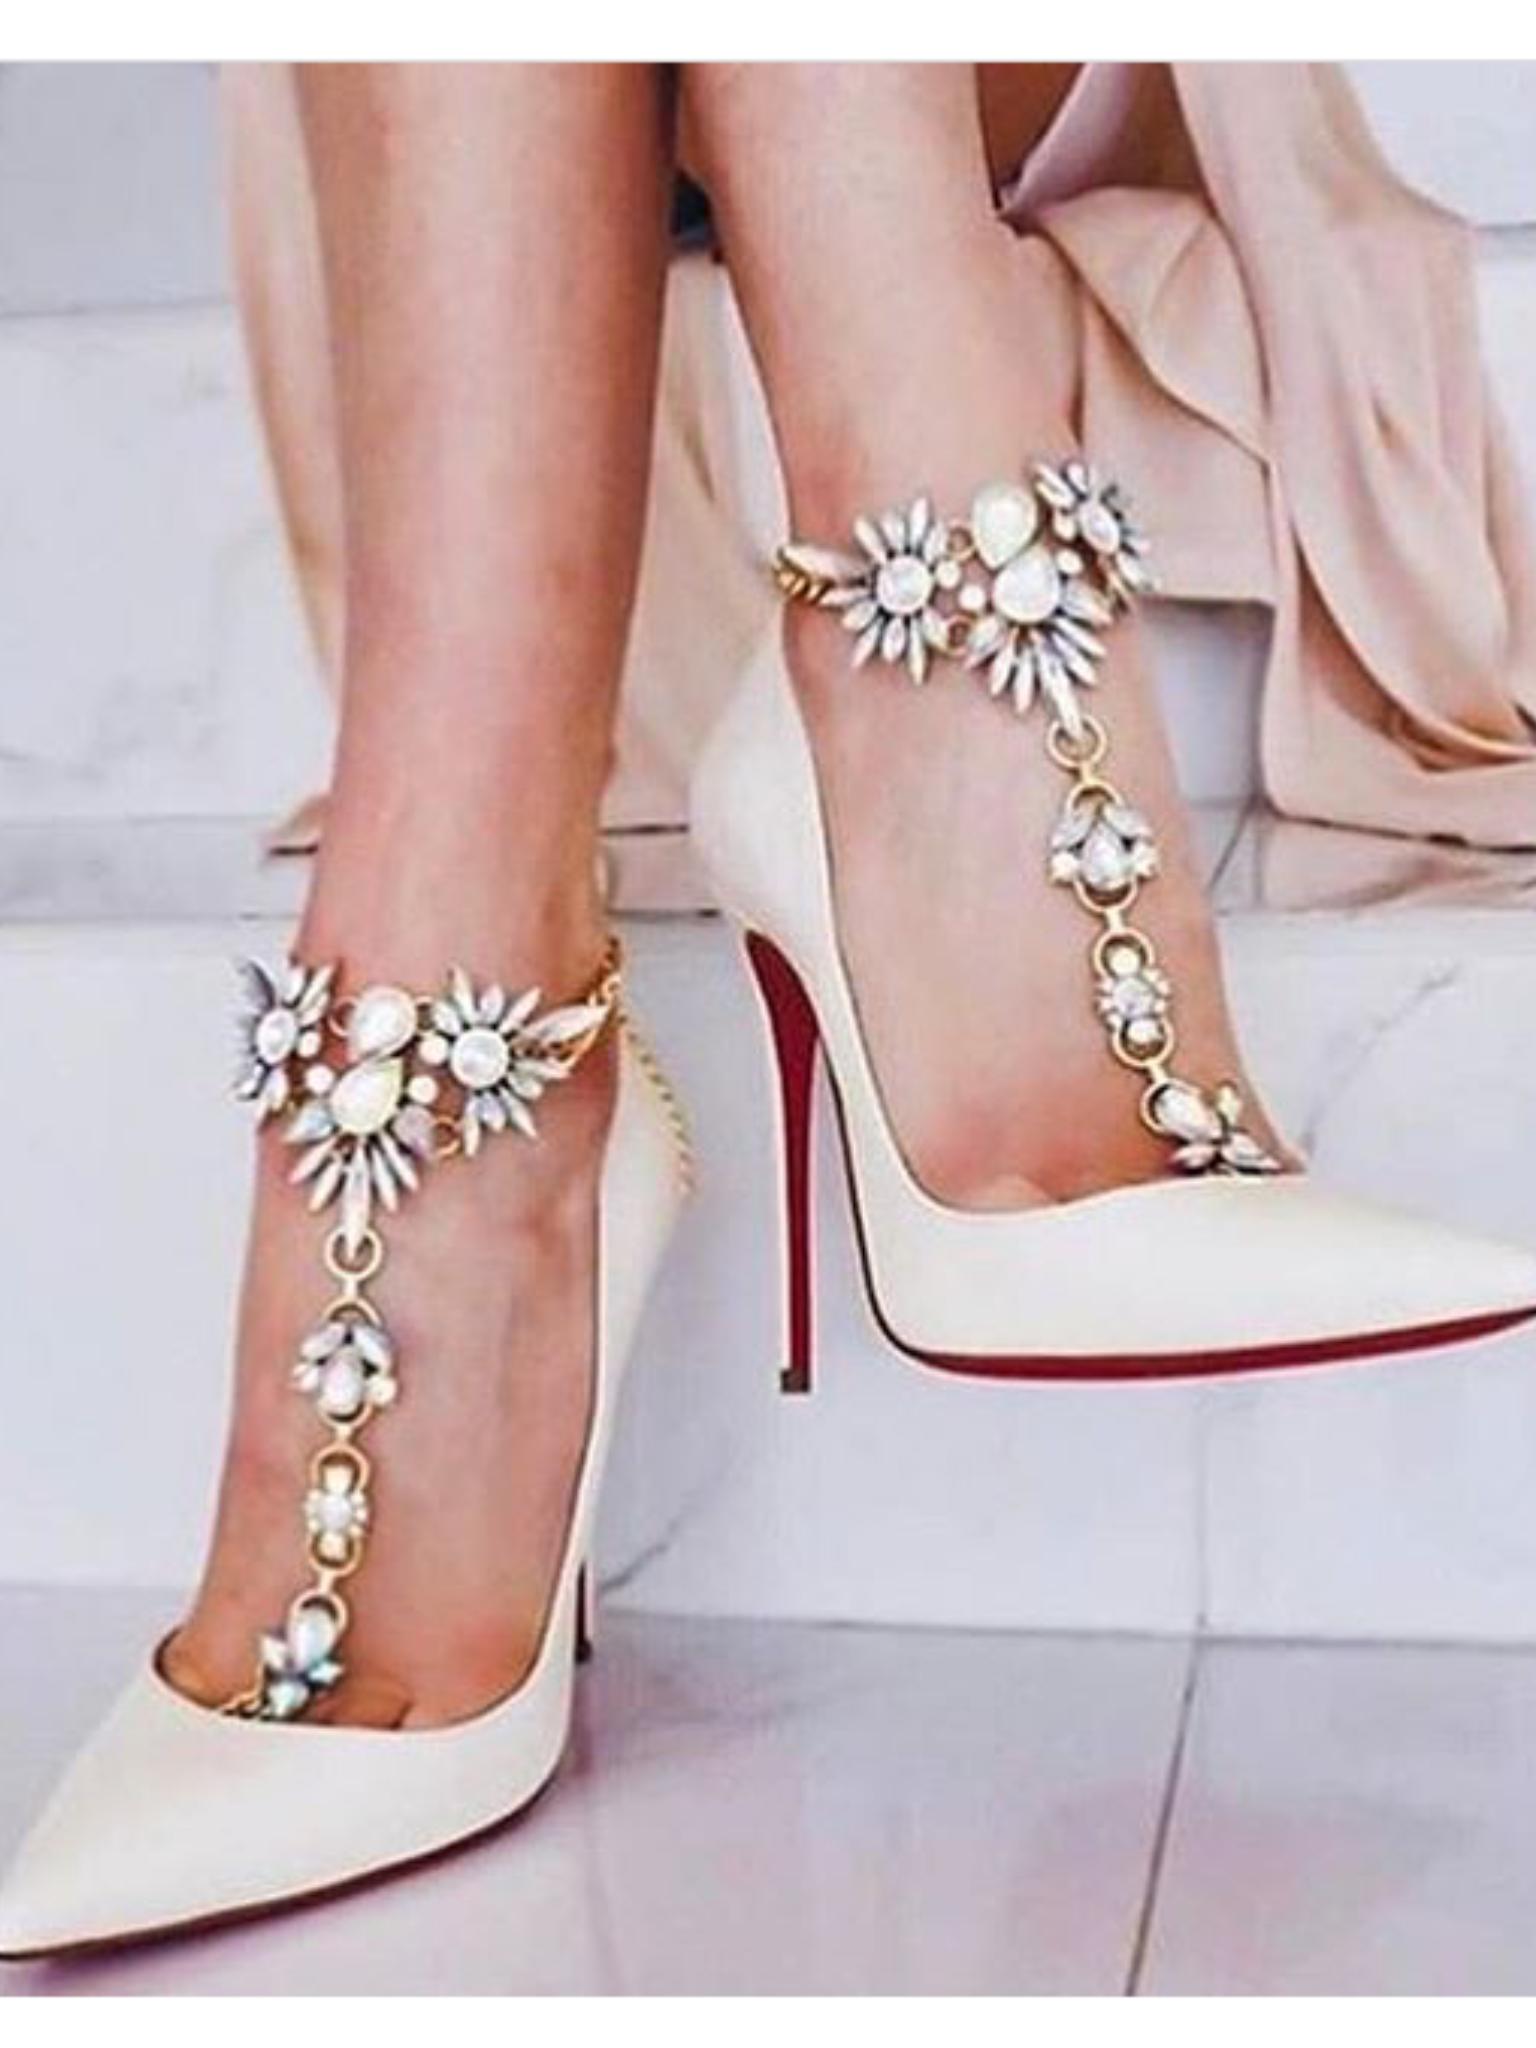 SHOES# | Shoes | Pinterest | Zapatos, Novia china y Zapatos para novia